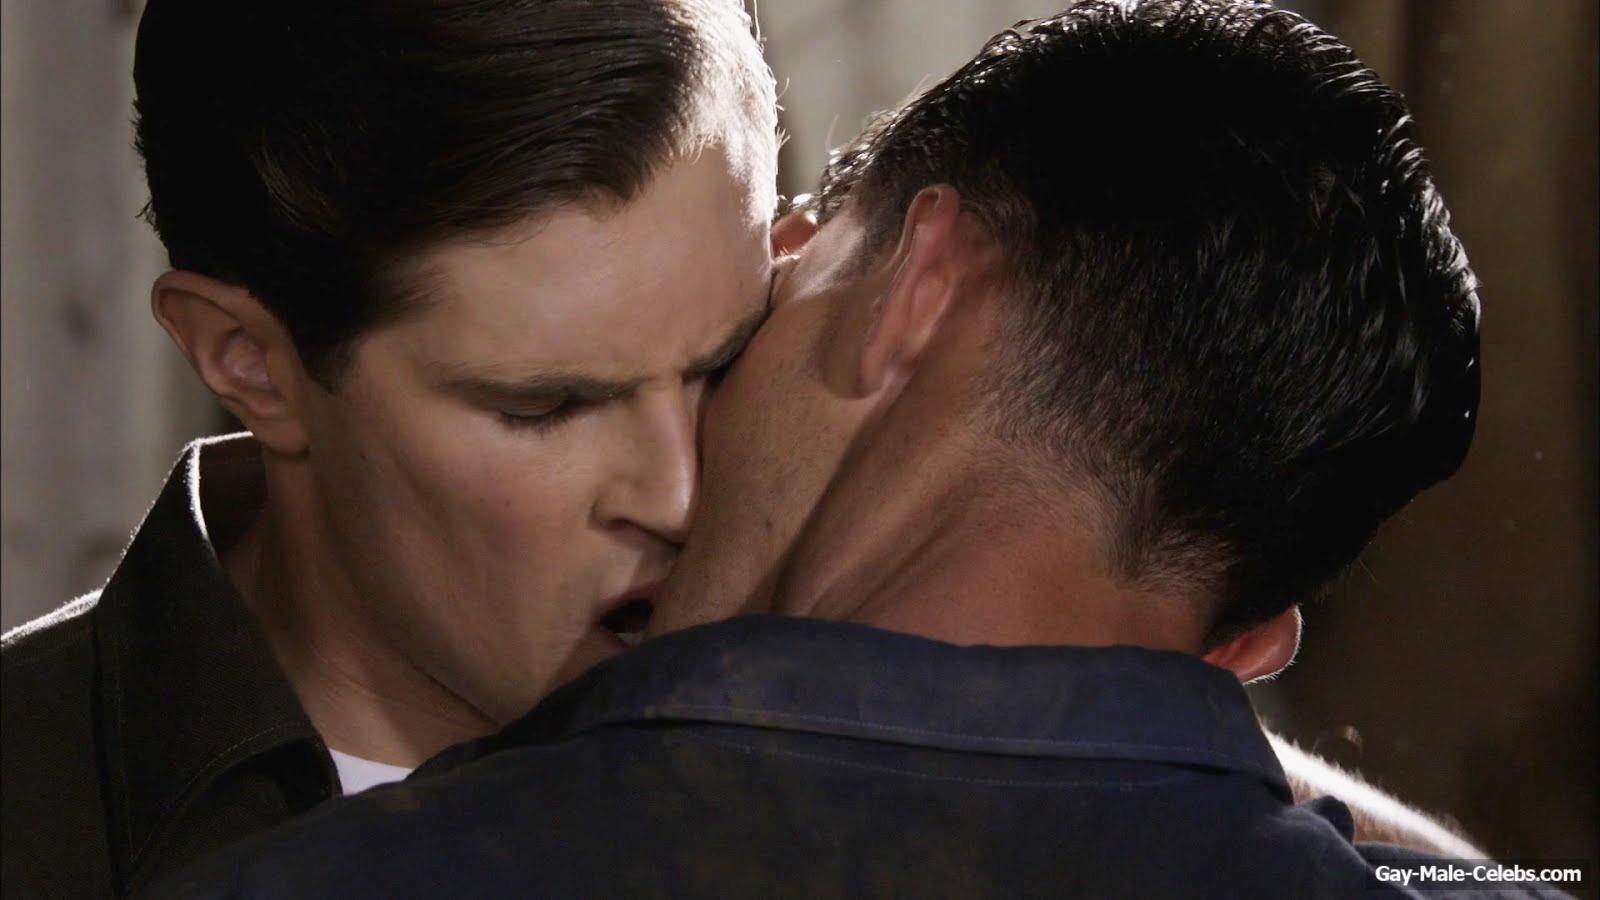 David Berry & Dominic Allburn Hot Gay Kiss Video